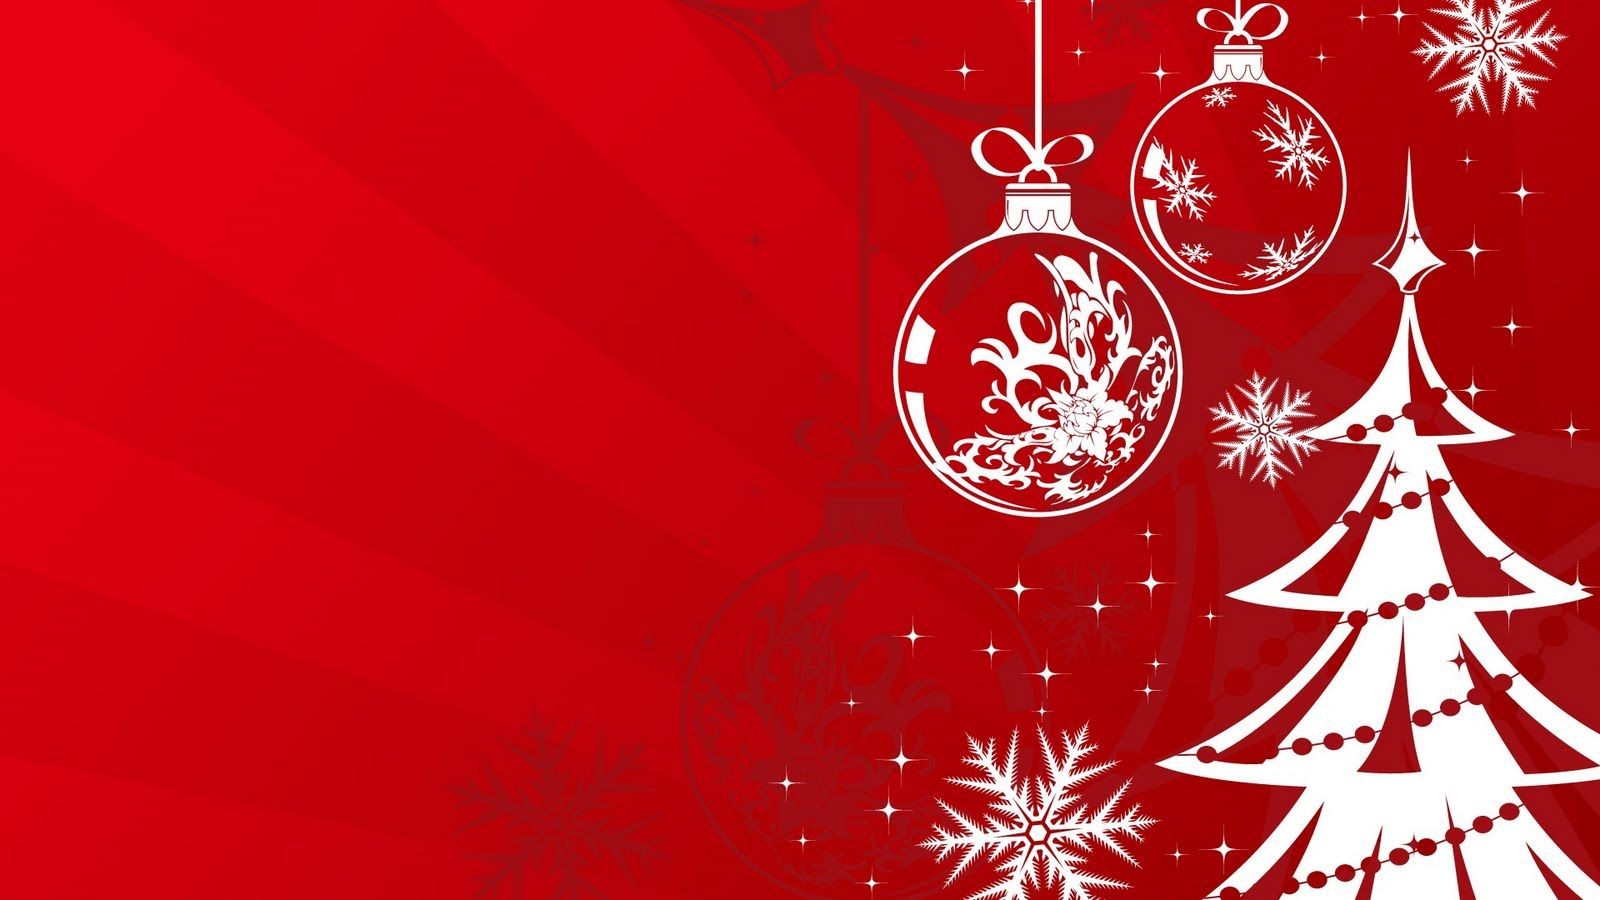 Trololo Blogg Wallpaper Kostenlos Weihnachten Avec Bilder mit Bilder Kostenlos Weihnachten